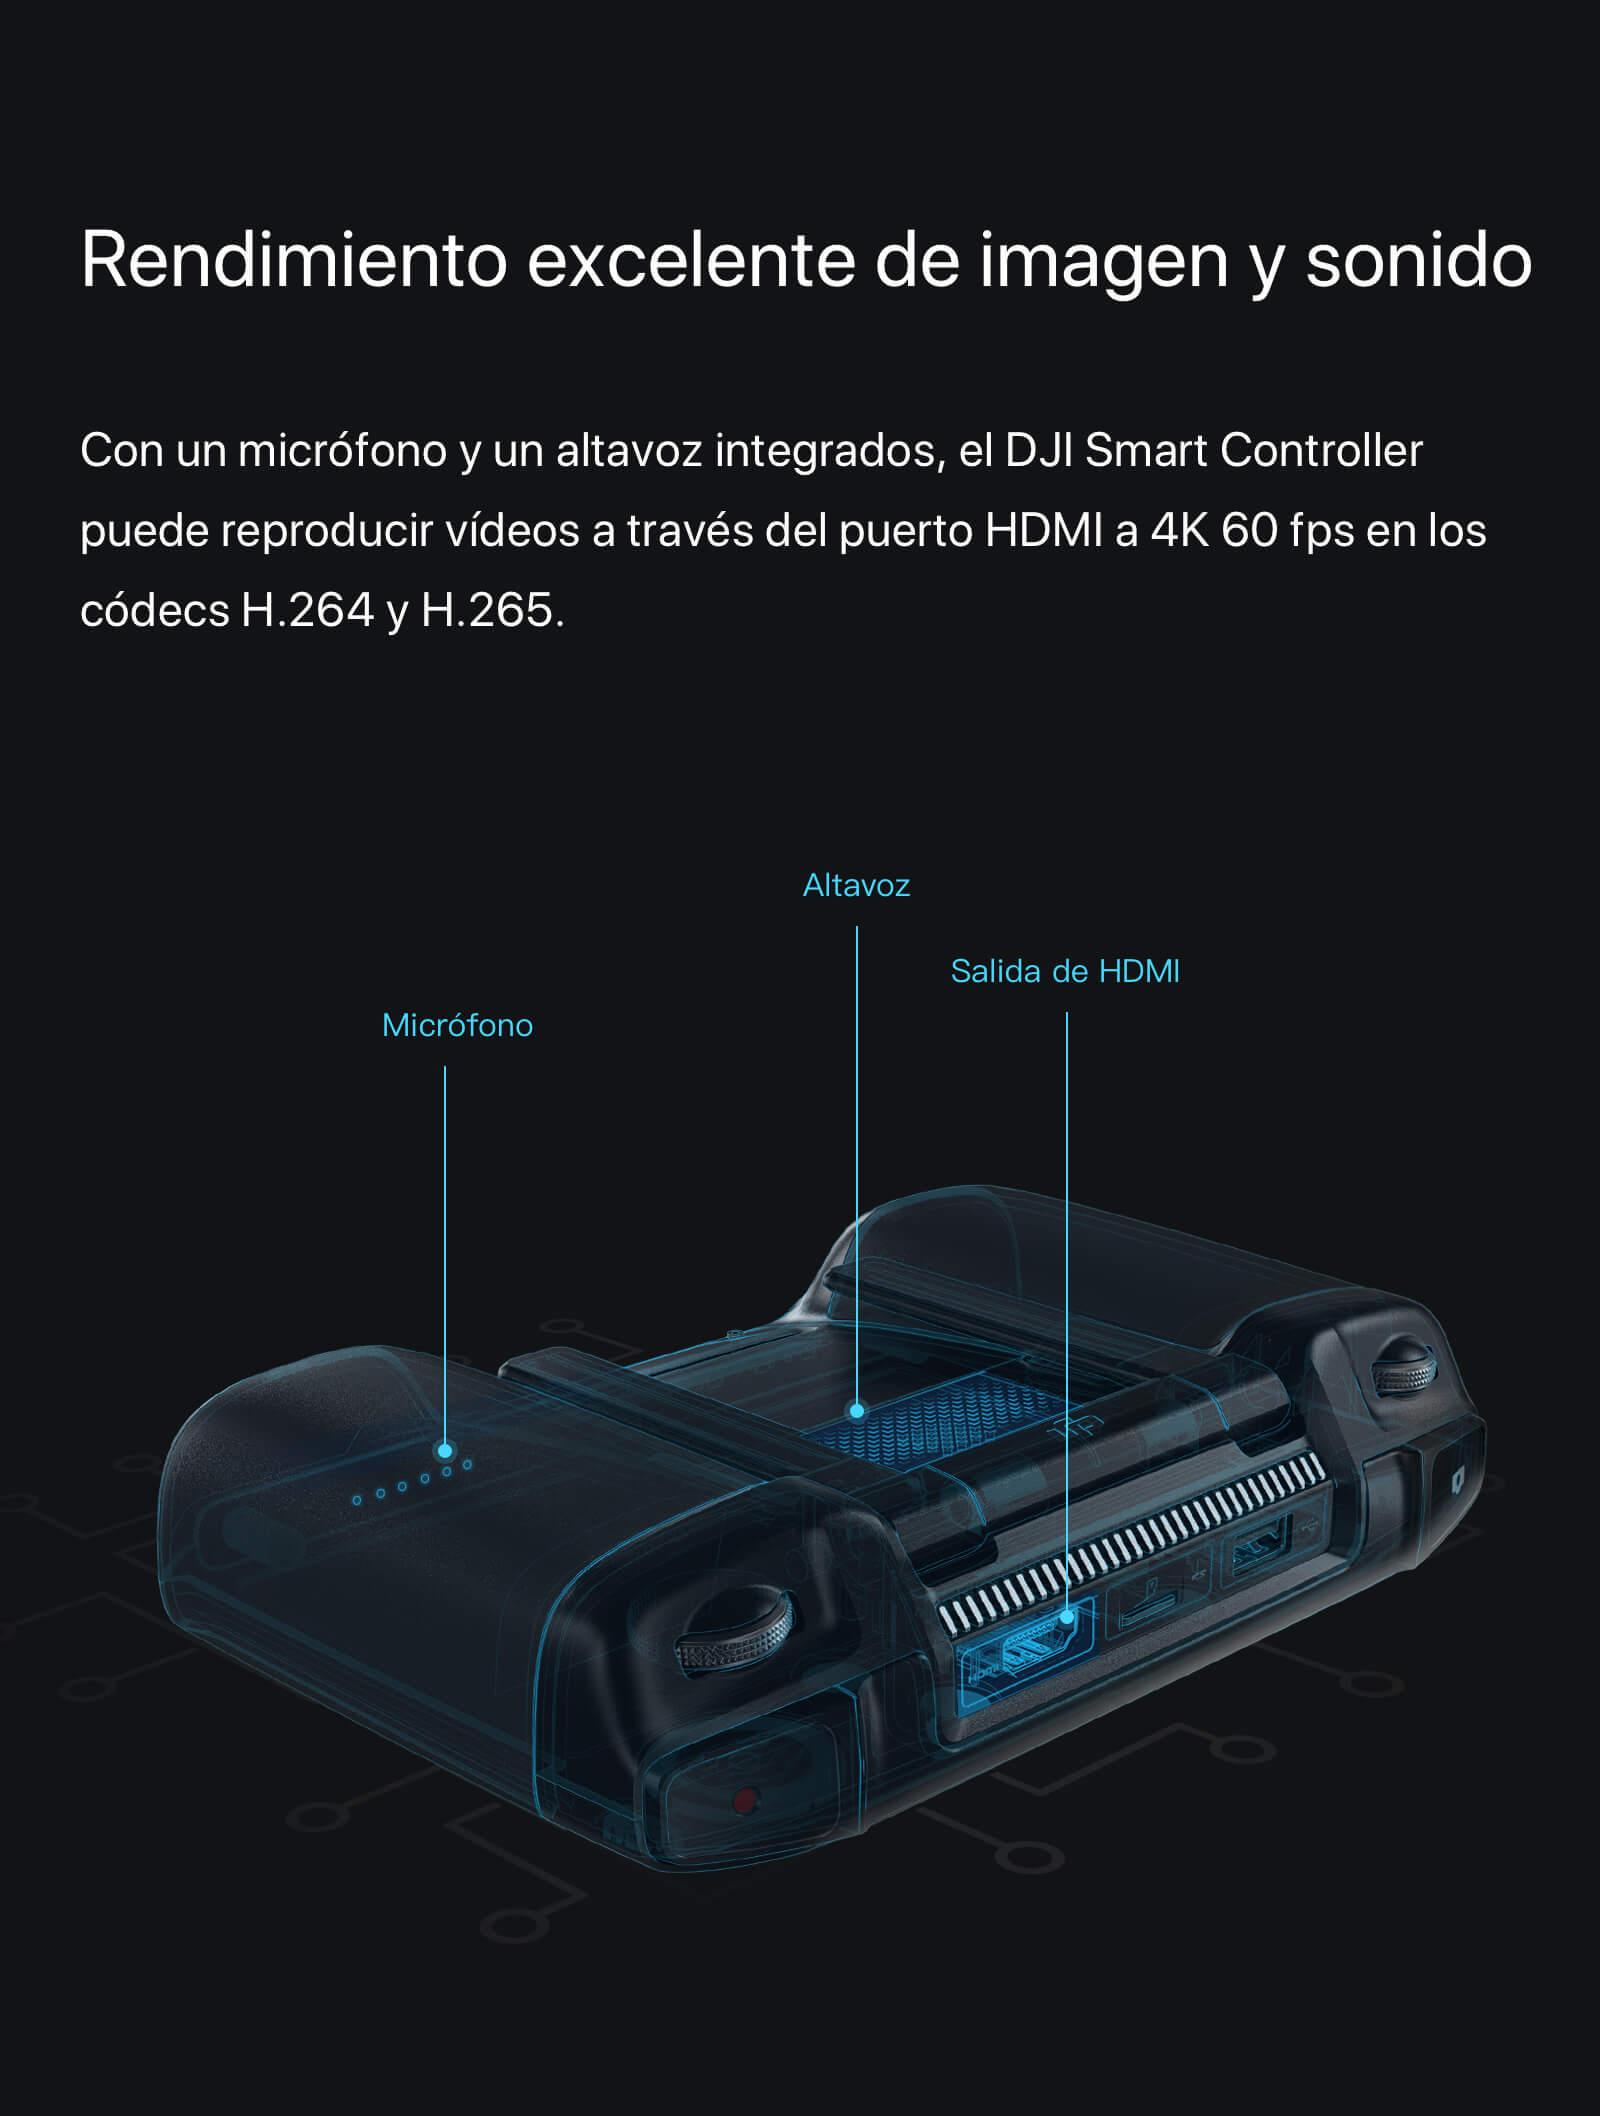 dji_smart_controller_stockrc7